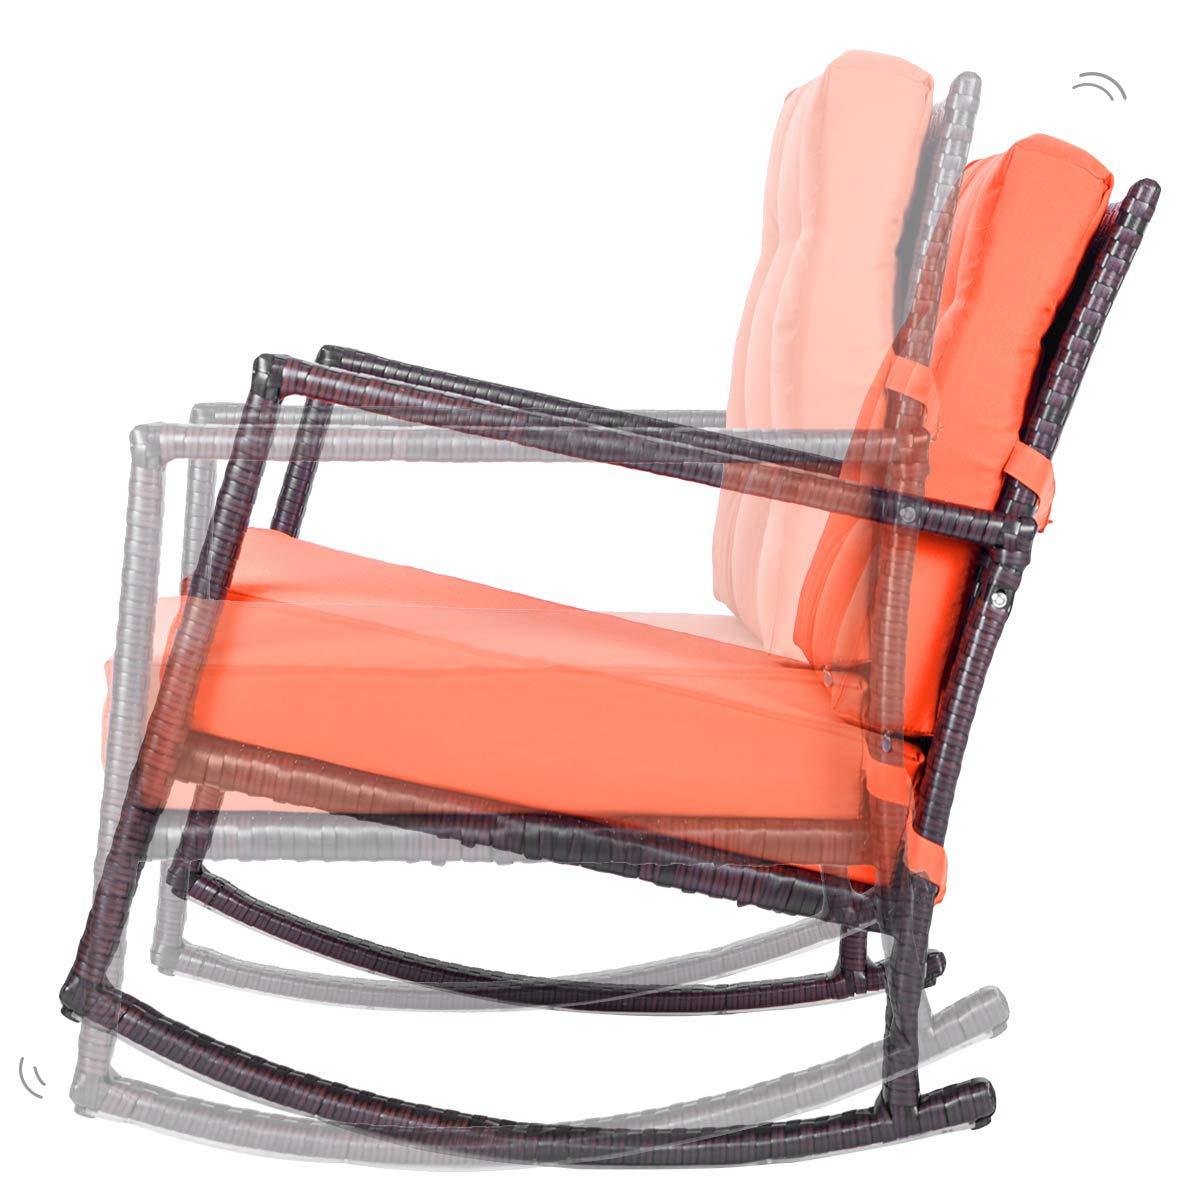 Astounding Amazon Com Patio Rattan Rocking Chair Knocbel Wicker Seat Machost Co Dining Chair Design Ideas Machostcouk